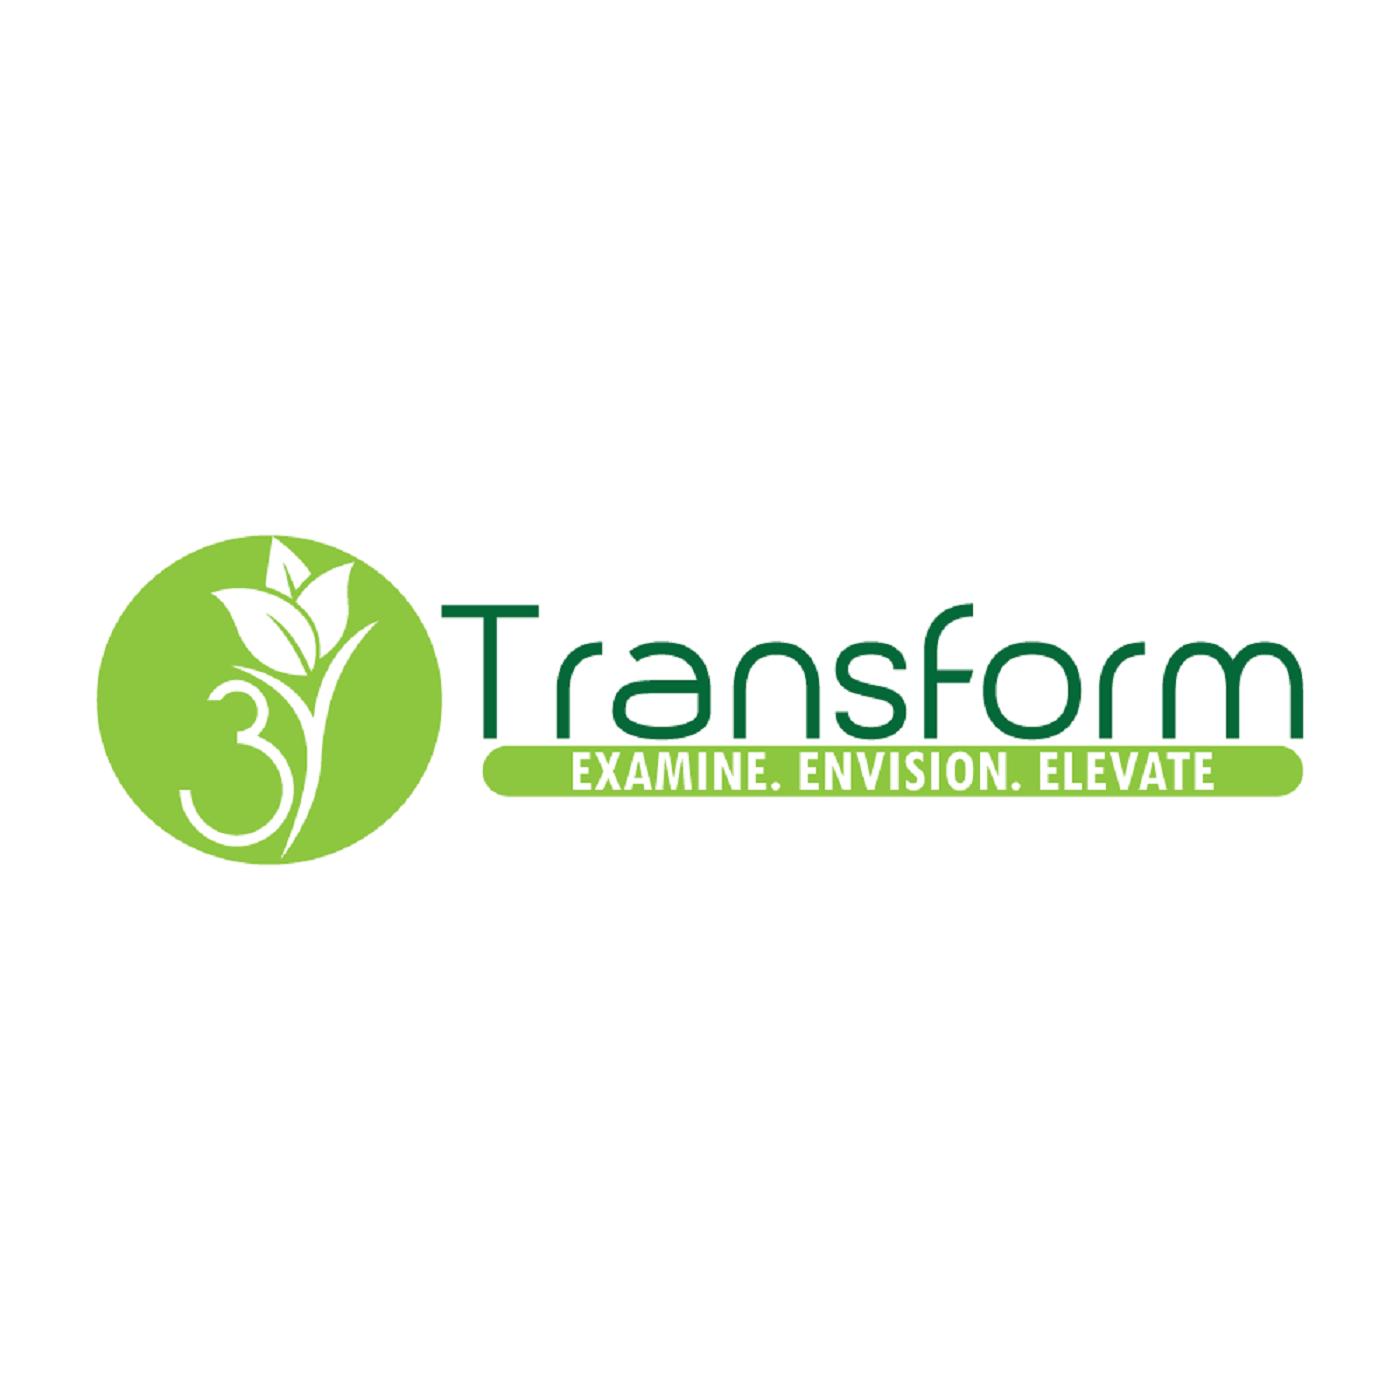 3Transform11